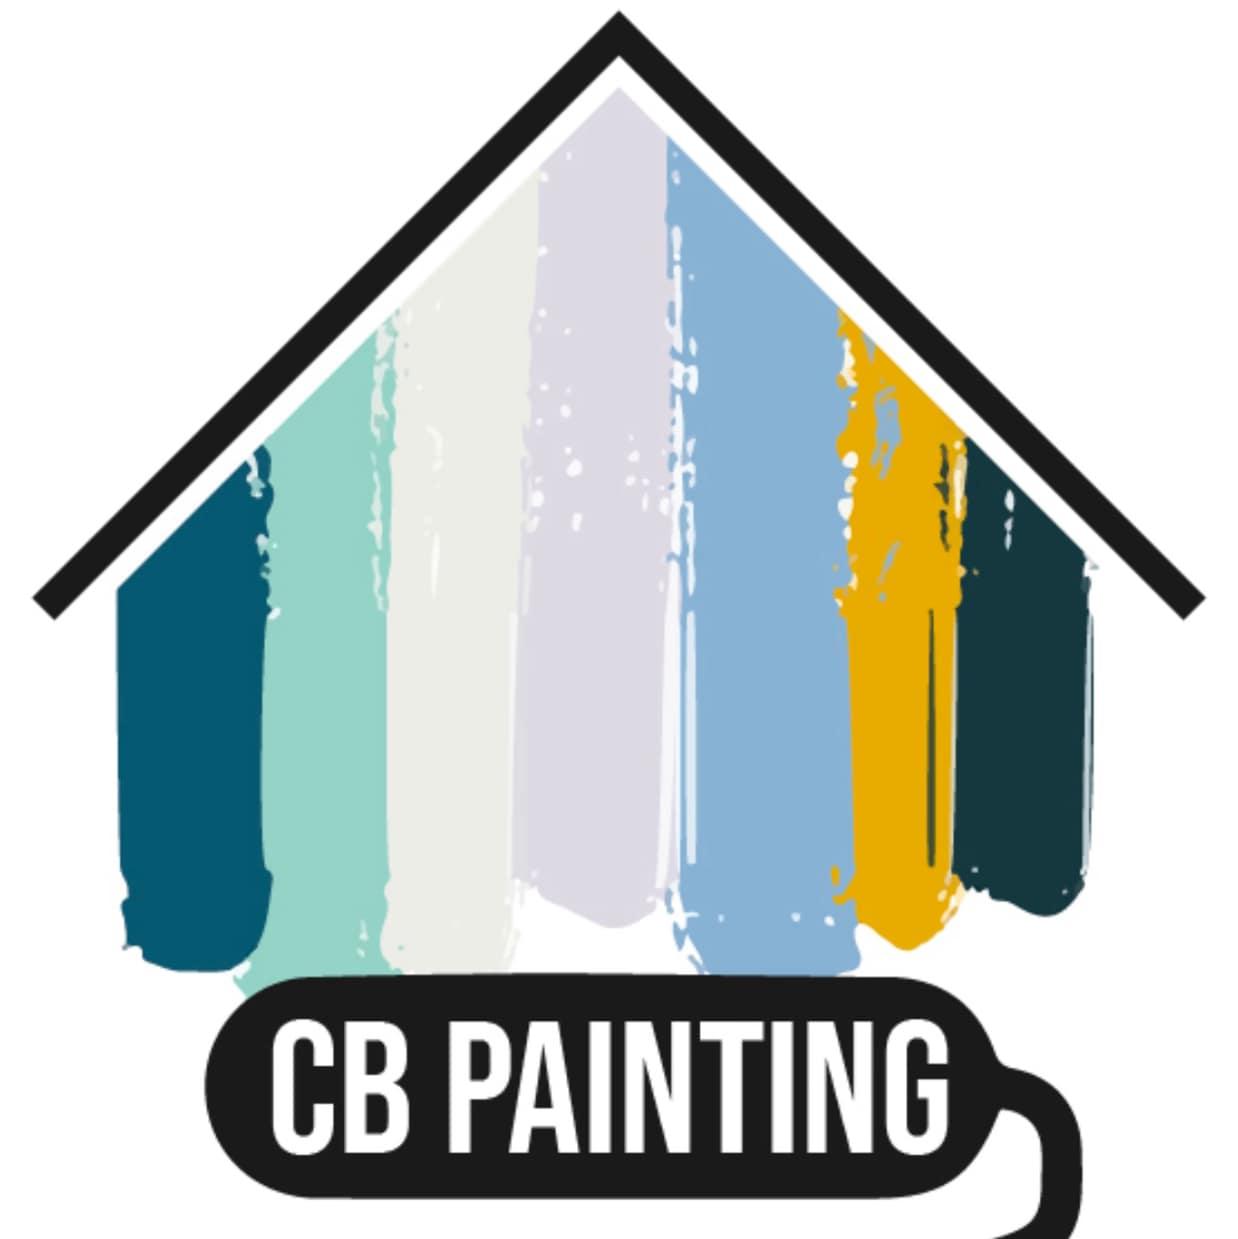 C B Painting logo